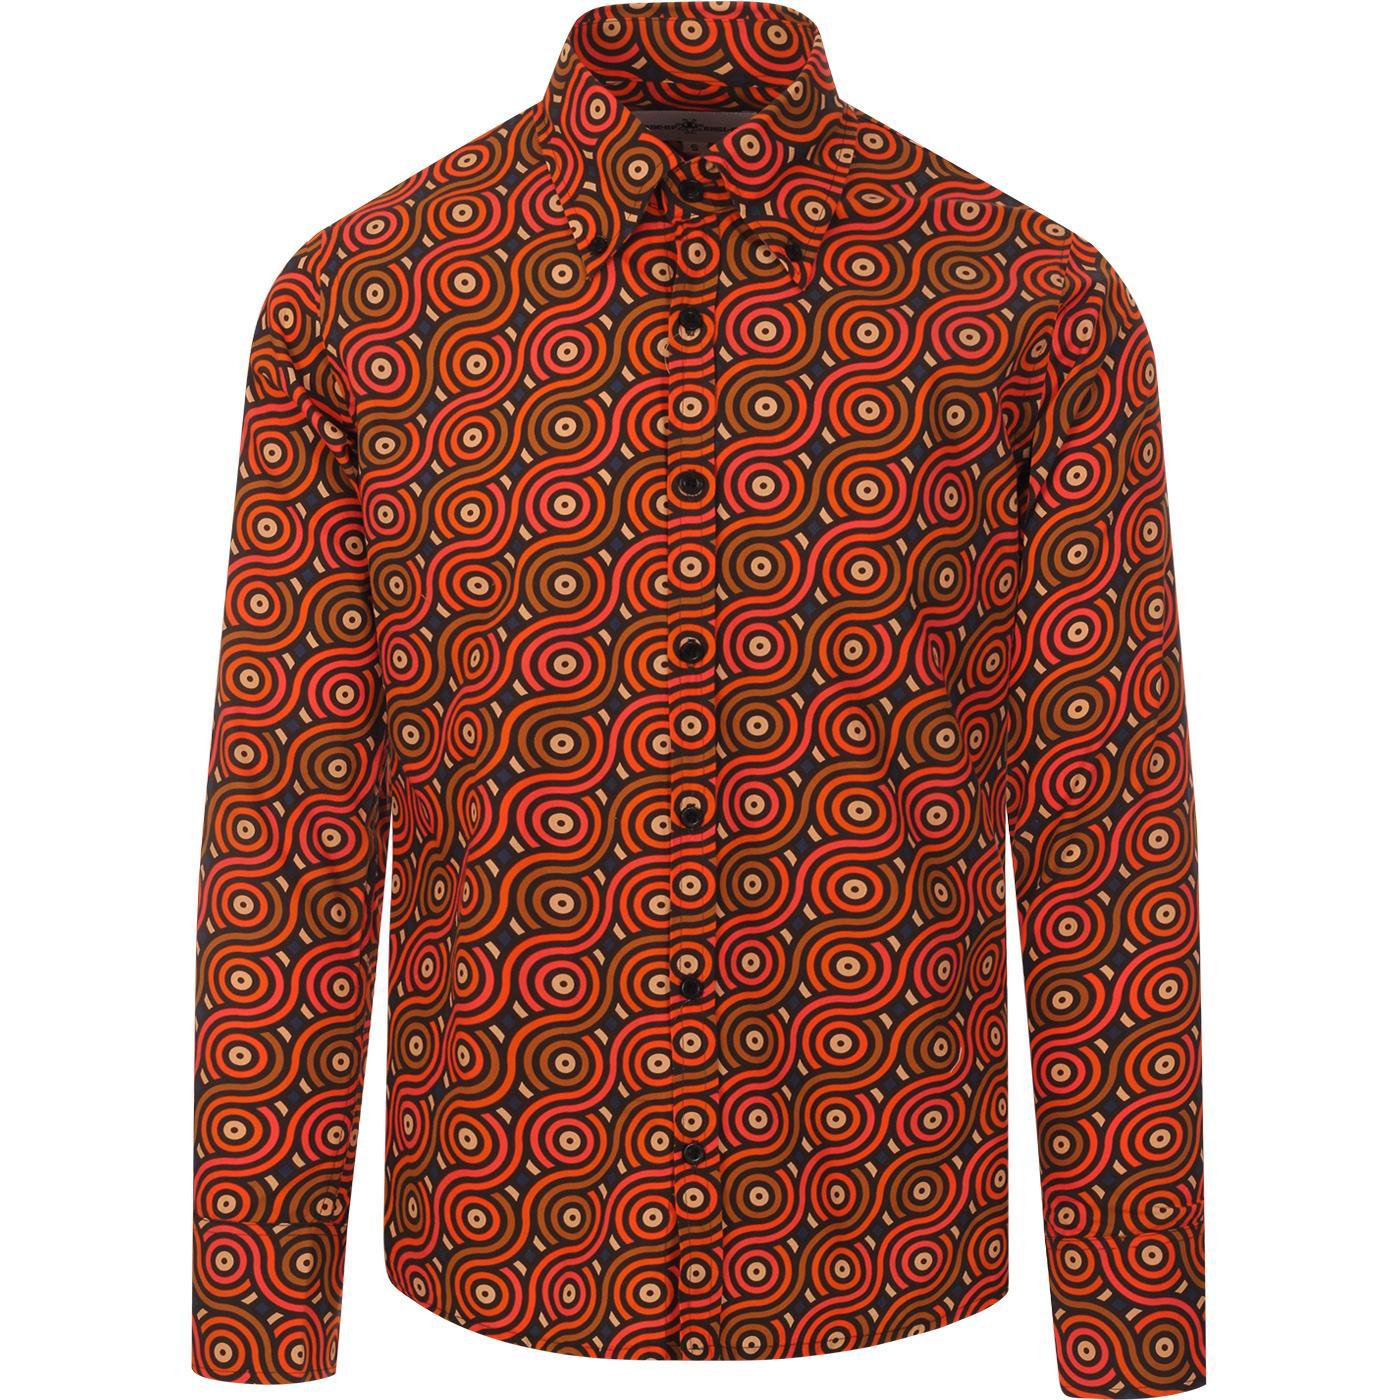 Trip Rainbow Rolls MADCAP ENGLAND Retro 70s Shirt